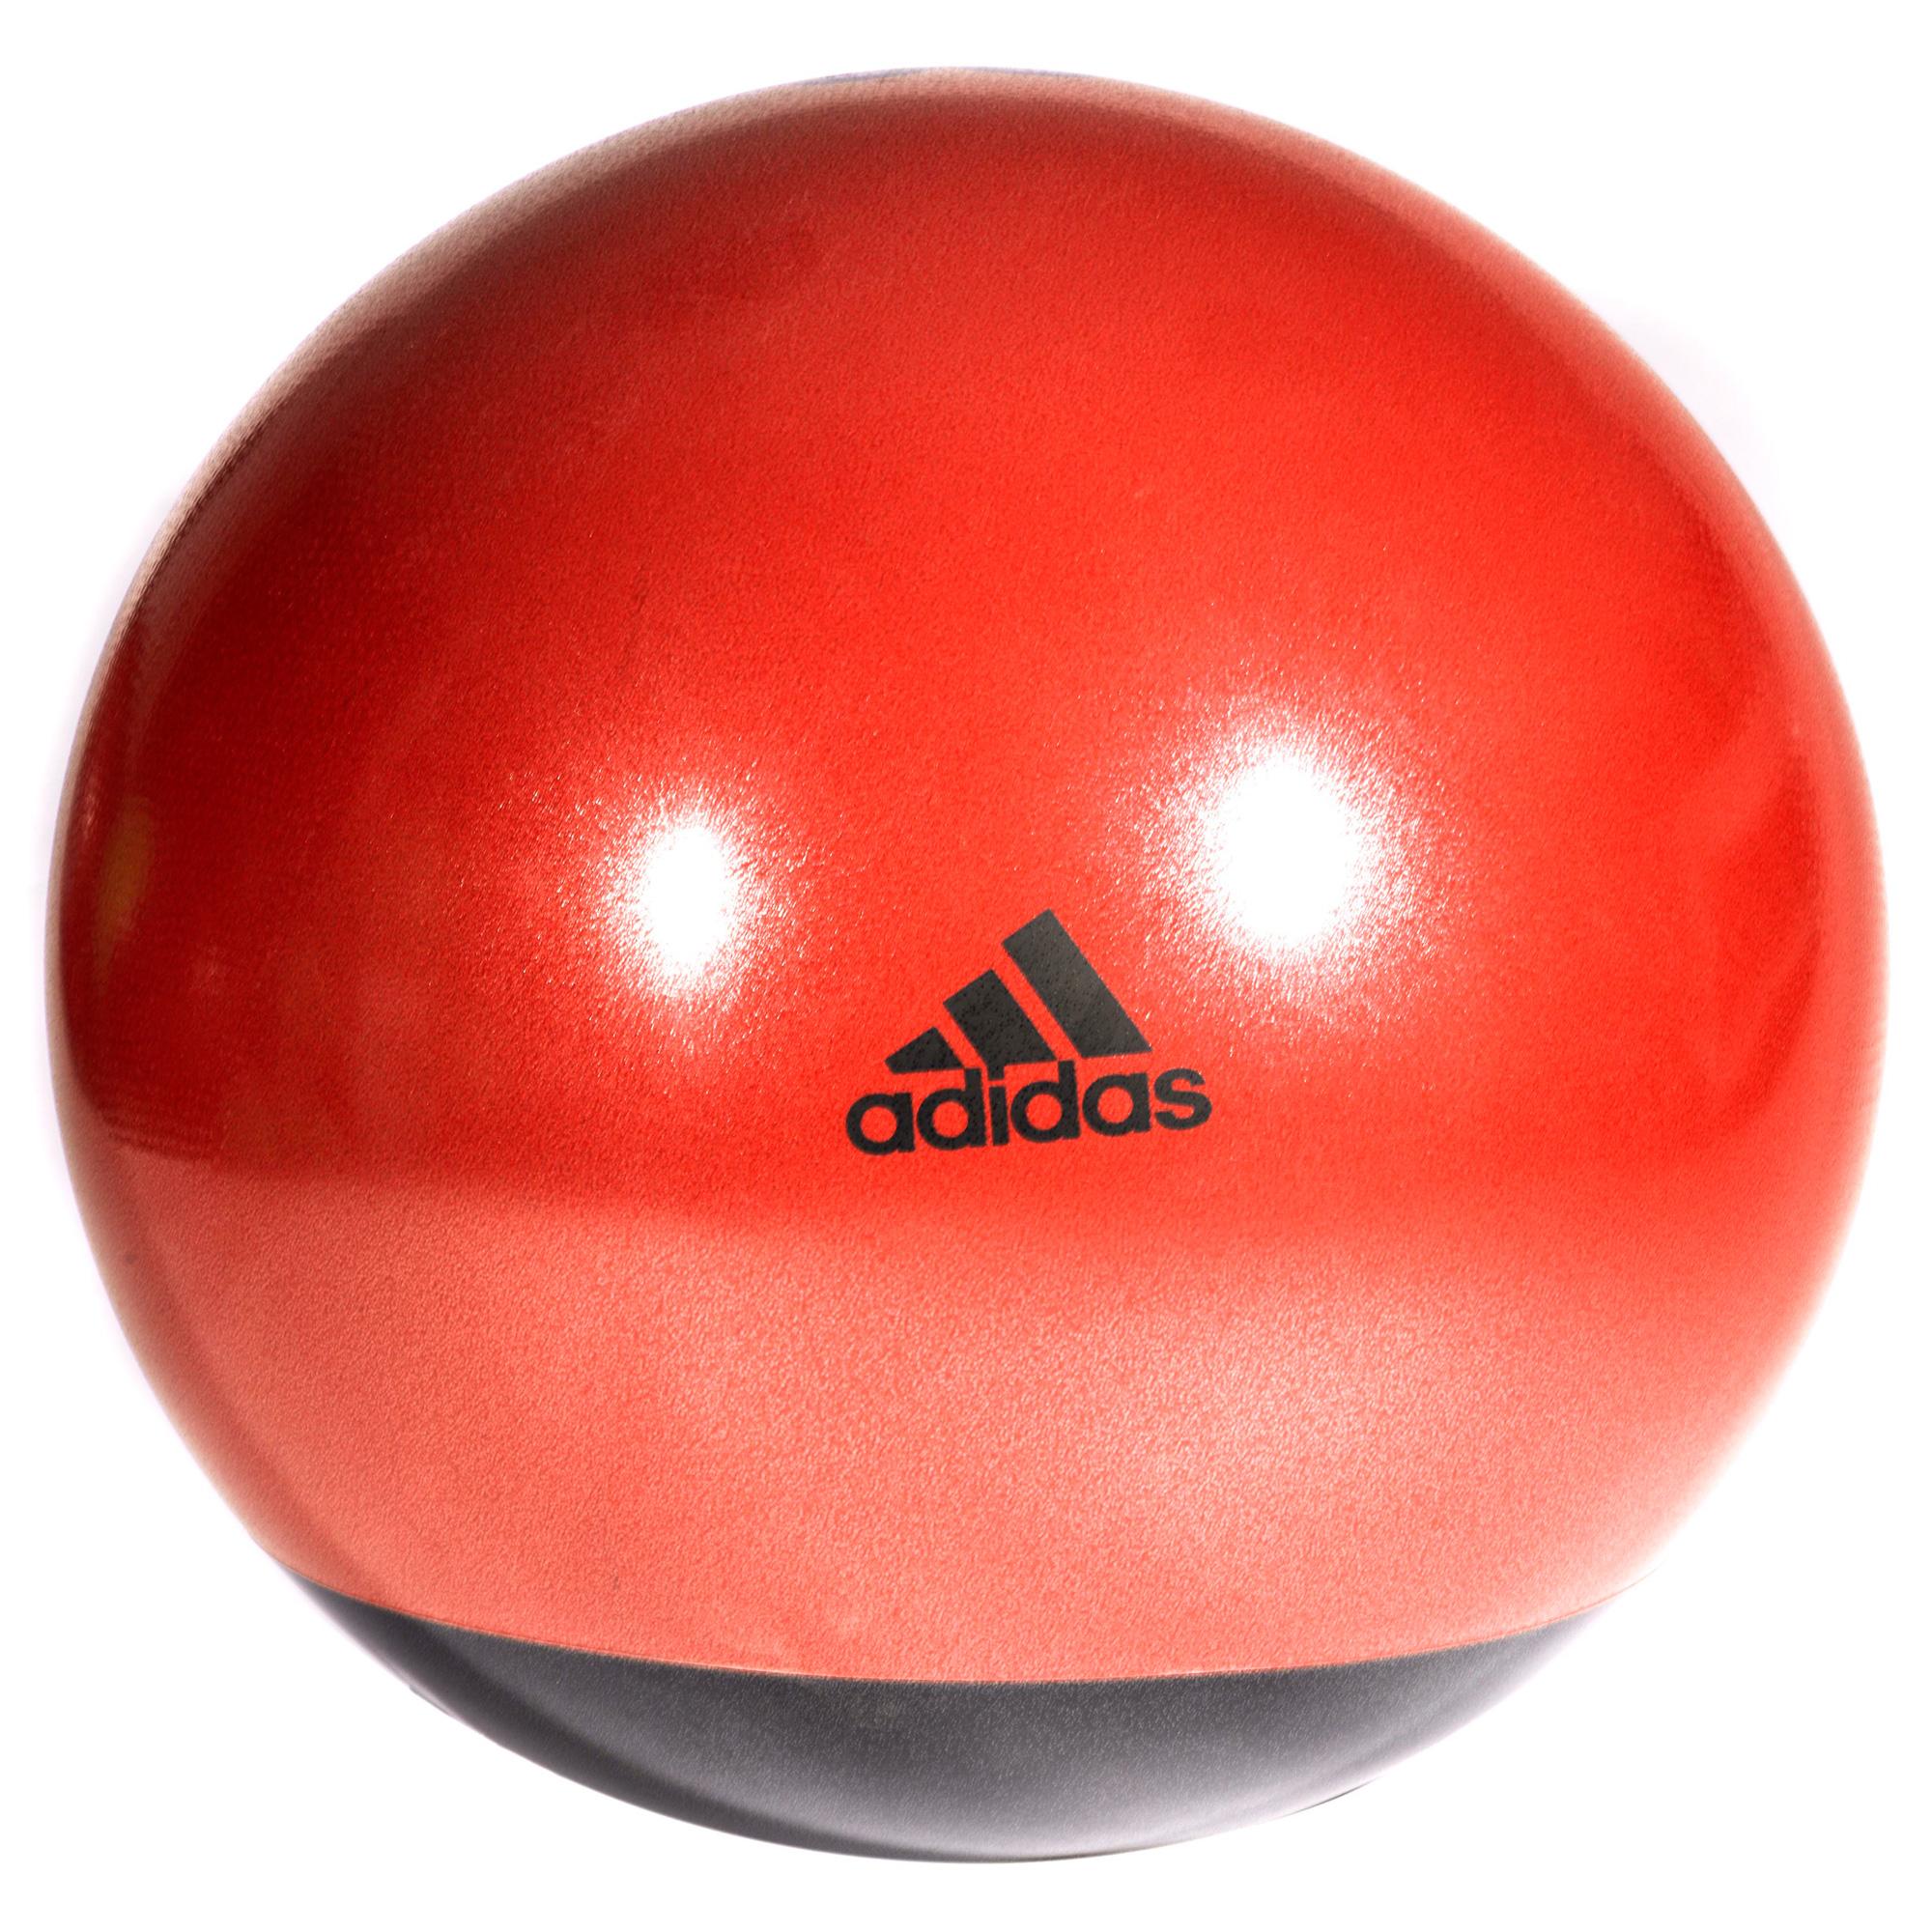 adidas 65cm Premium Gym Ball  Orange